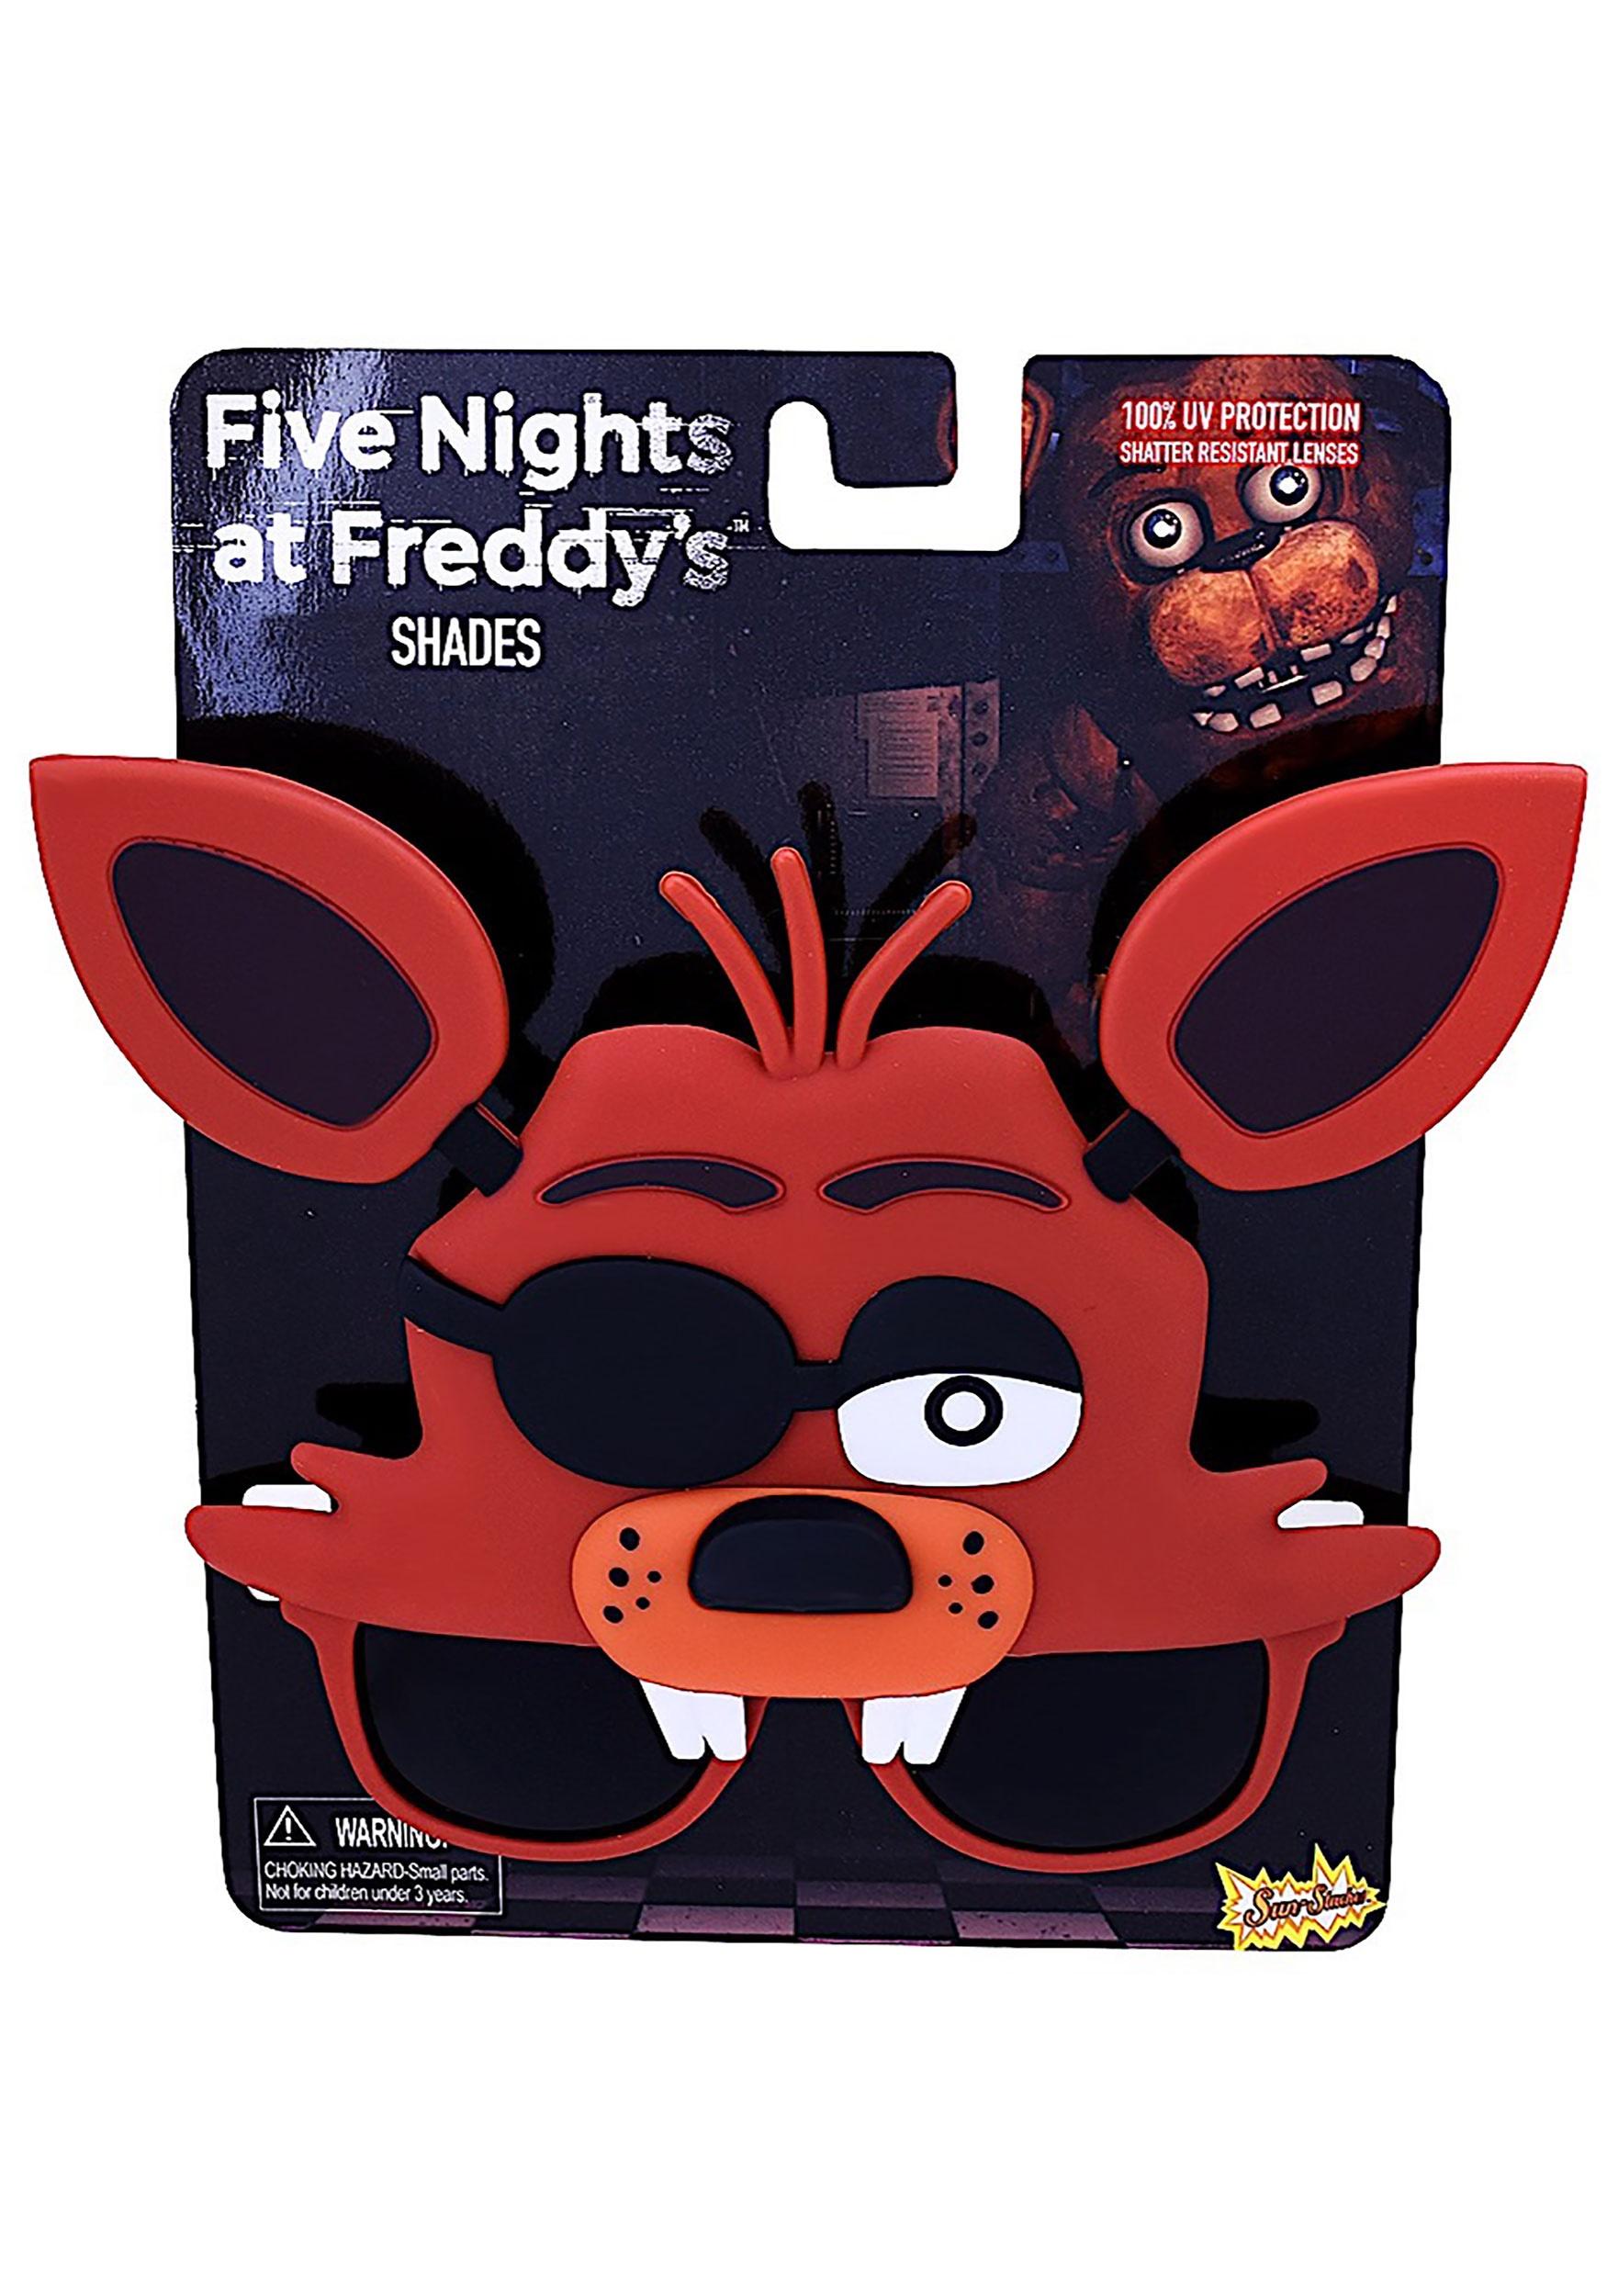 Five Nights At Freddy S Bedroom Decor: Foxy Sunglasses From Five Nights At Freddy's